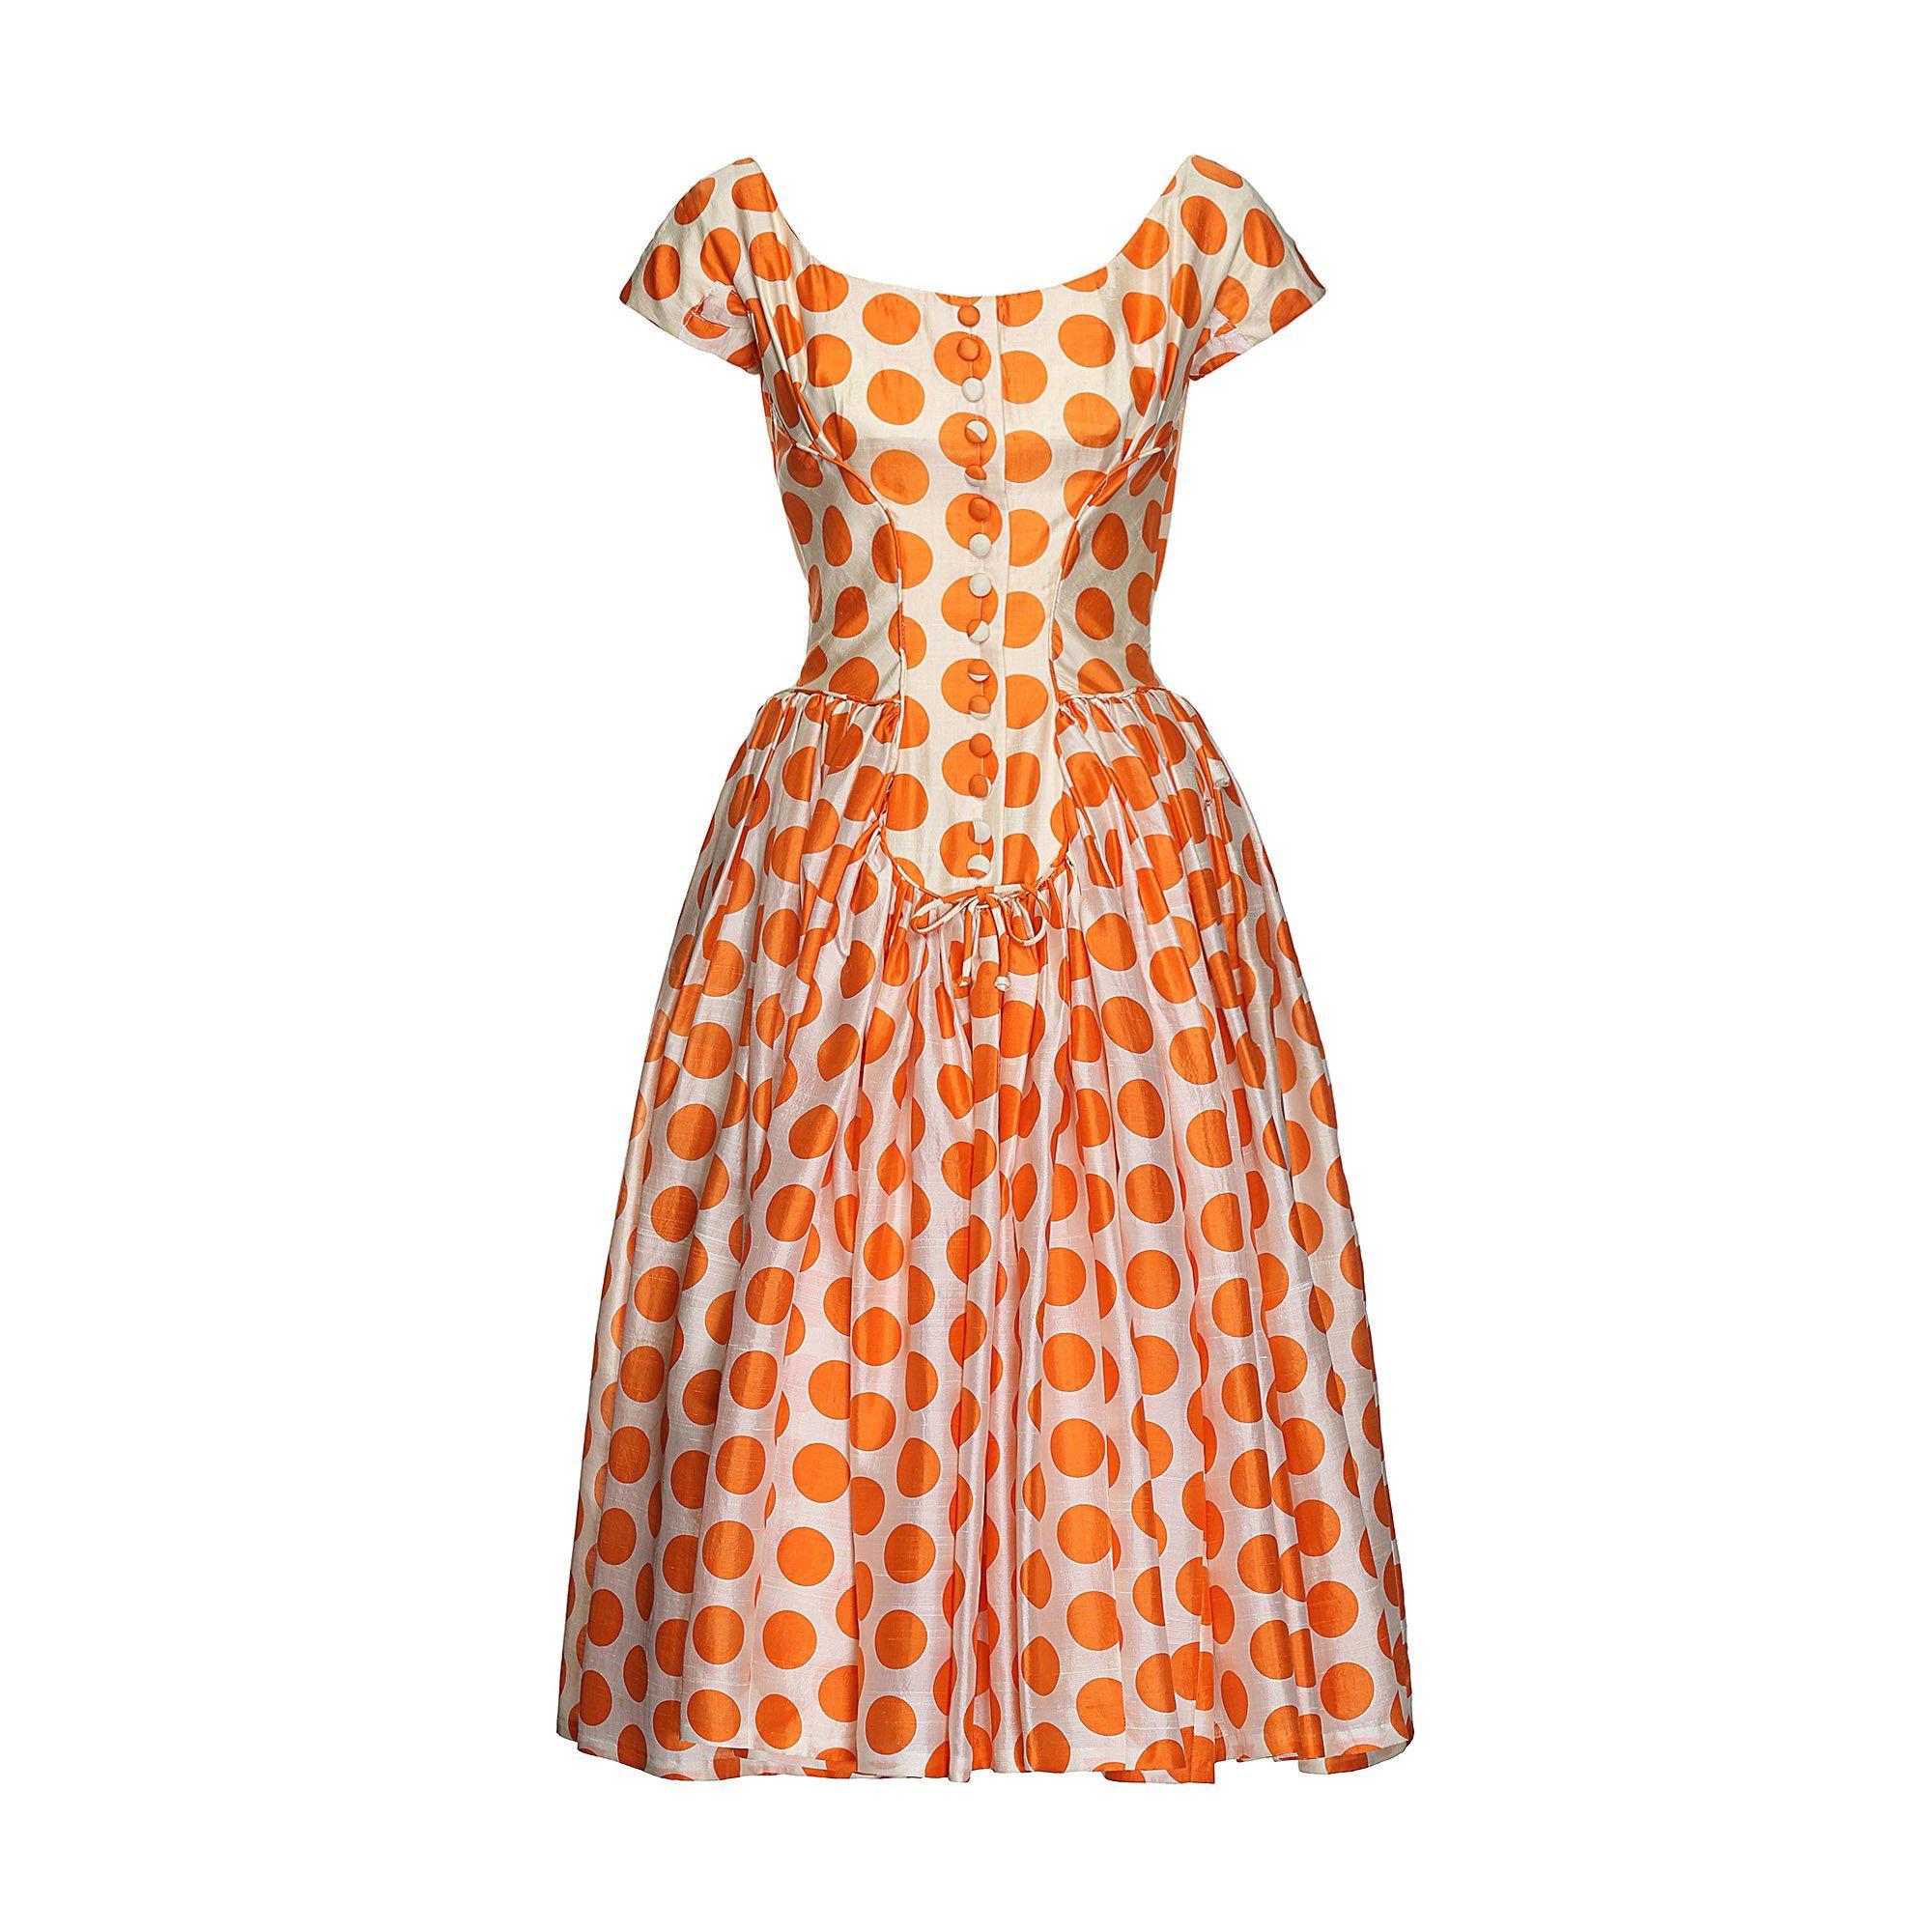 "<p><strong>Suzy Perette</strong> dress, $920, <a href=""https://ladoublej.com/shop/dresses/suzy-perette-dot-dress/"" target=""_blank"">ladoublej.com</a>. </p>"